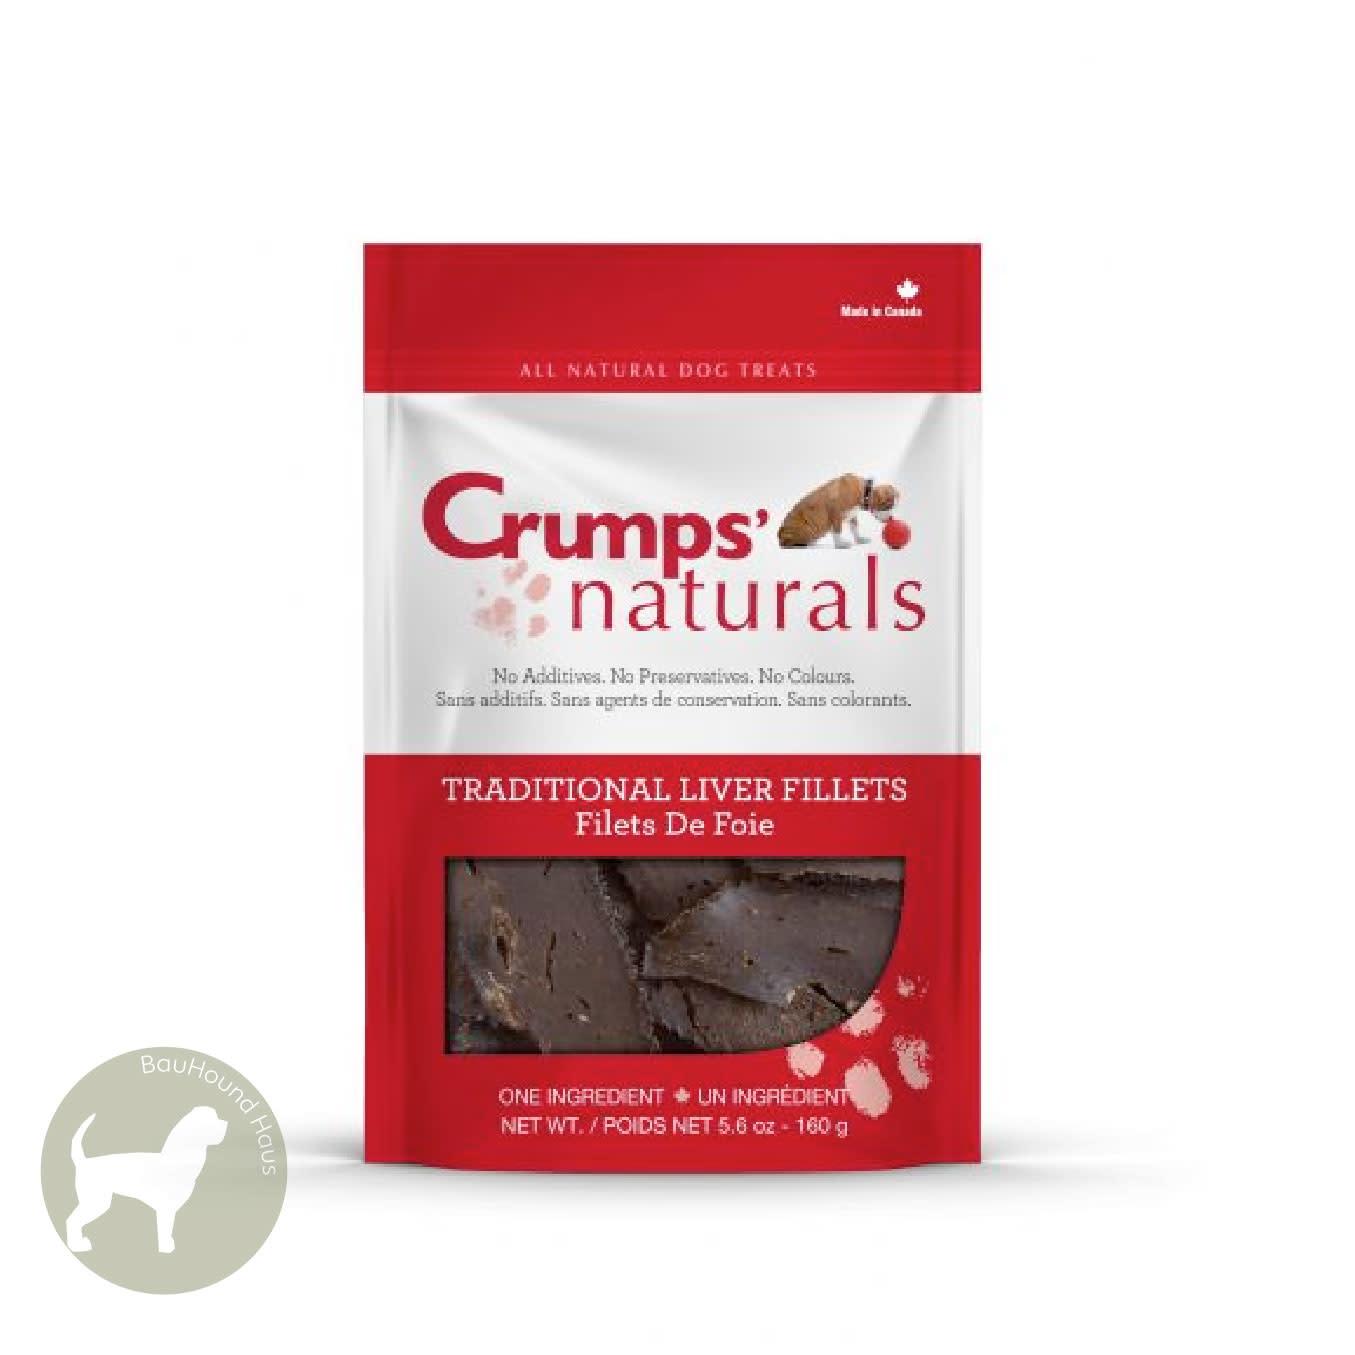 Crumps Crumps Natural Beef Liver Fillet, 75g